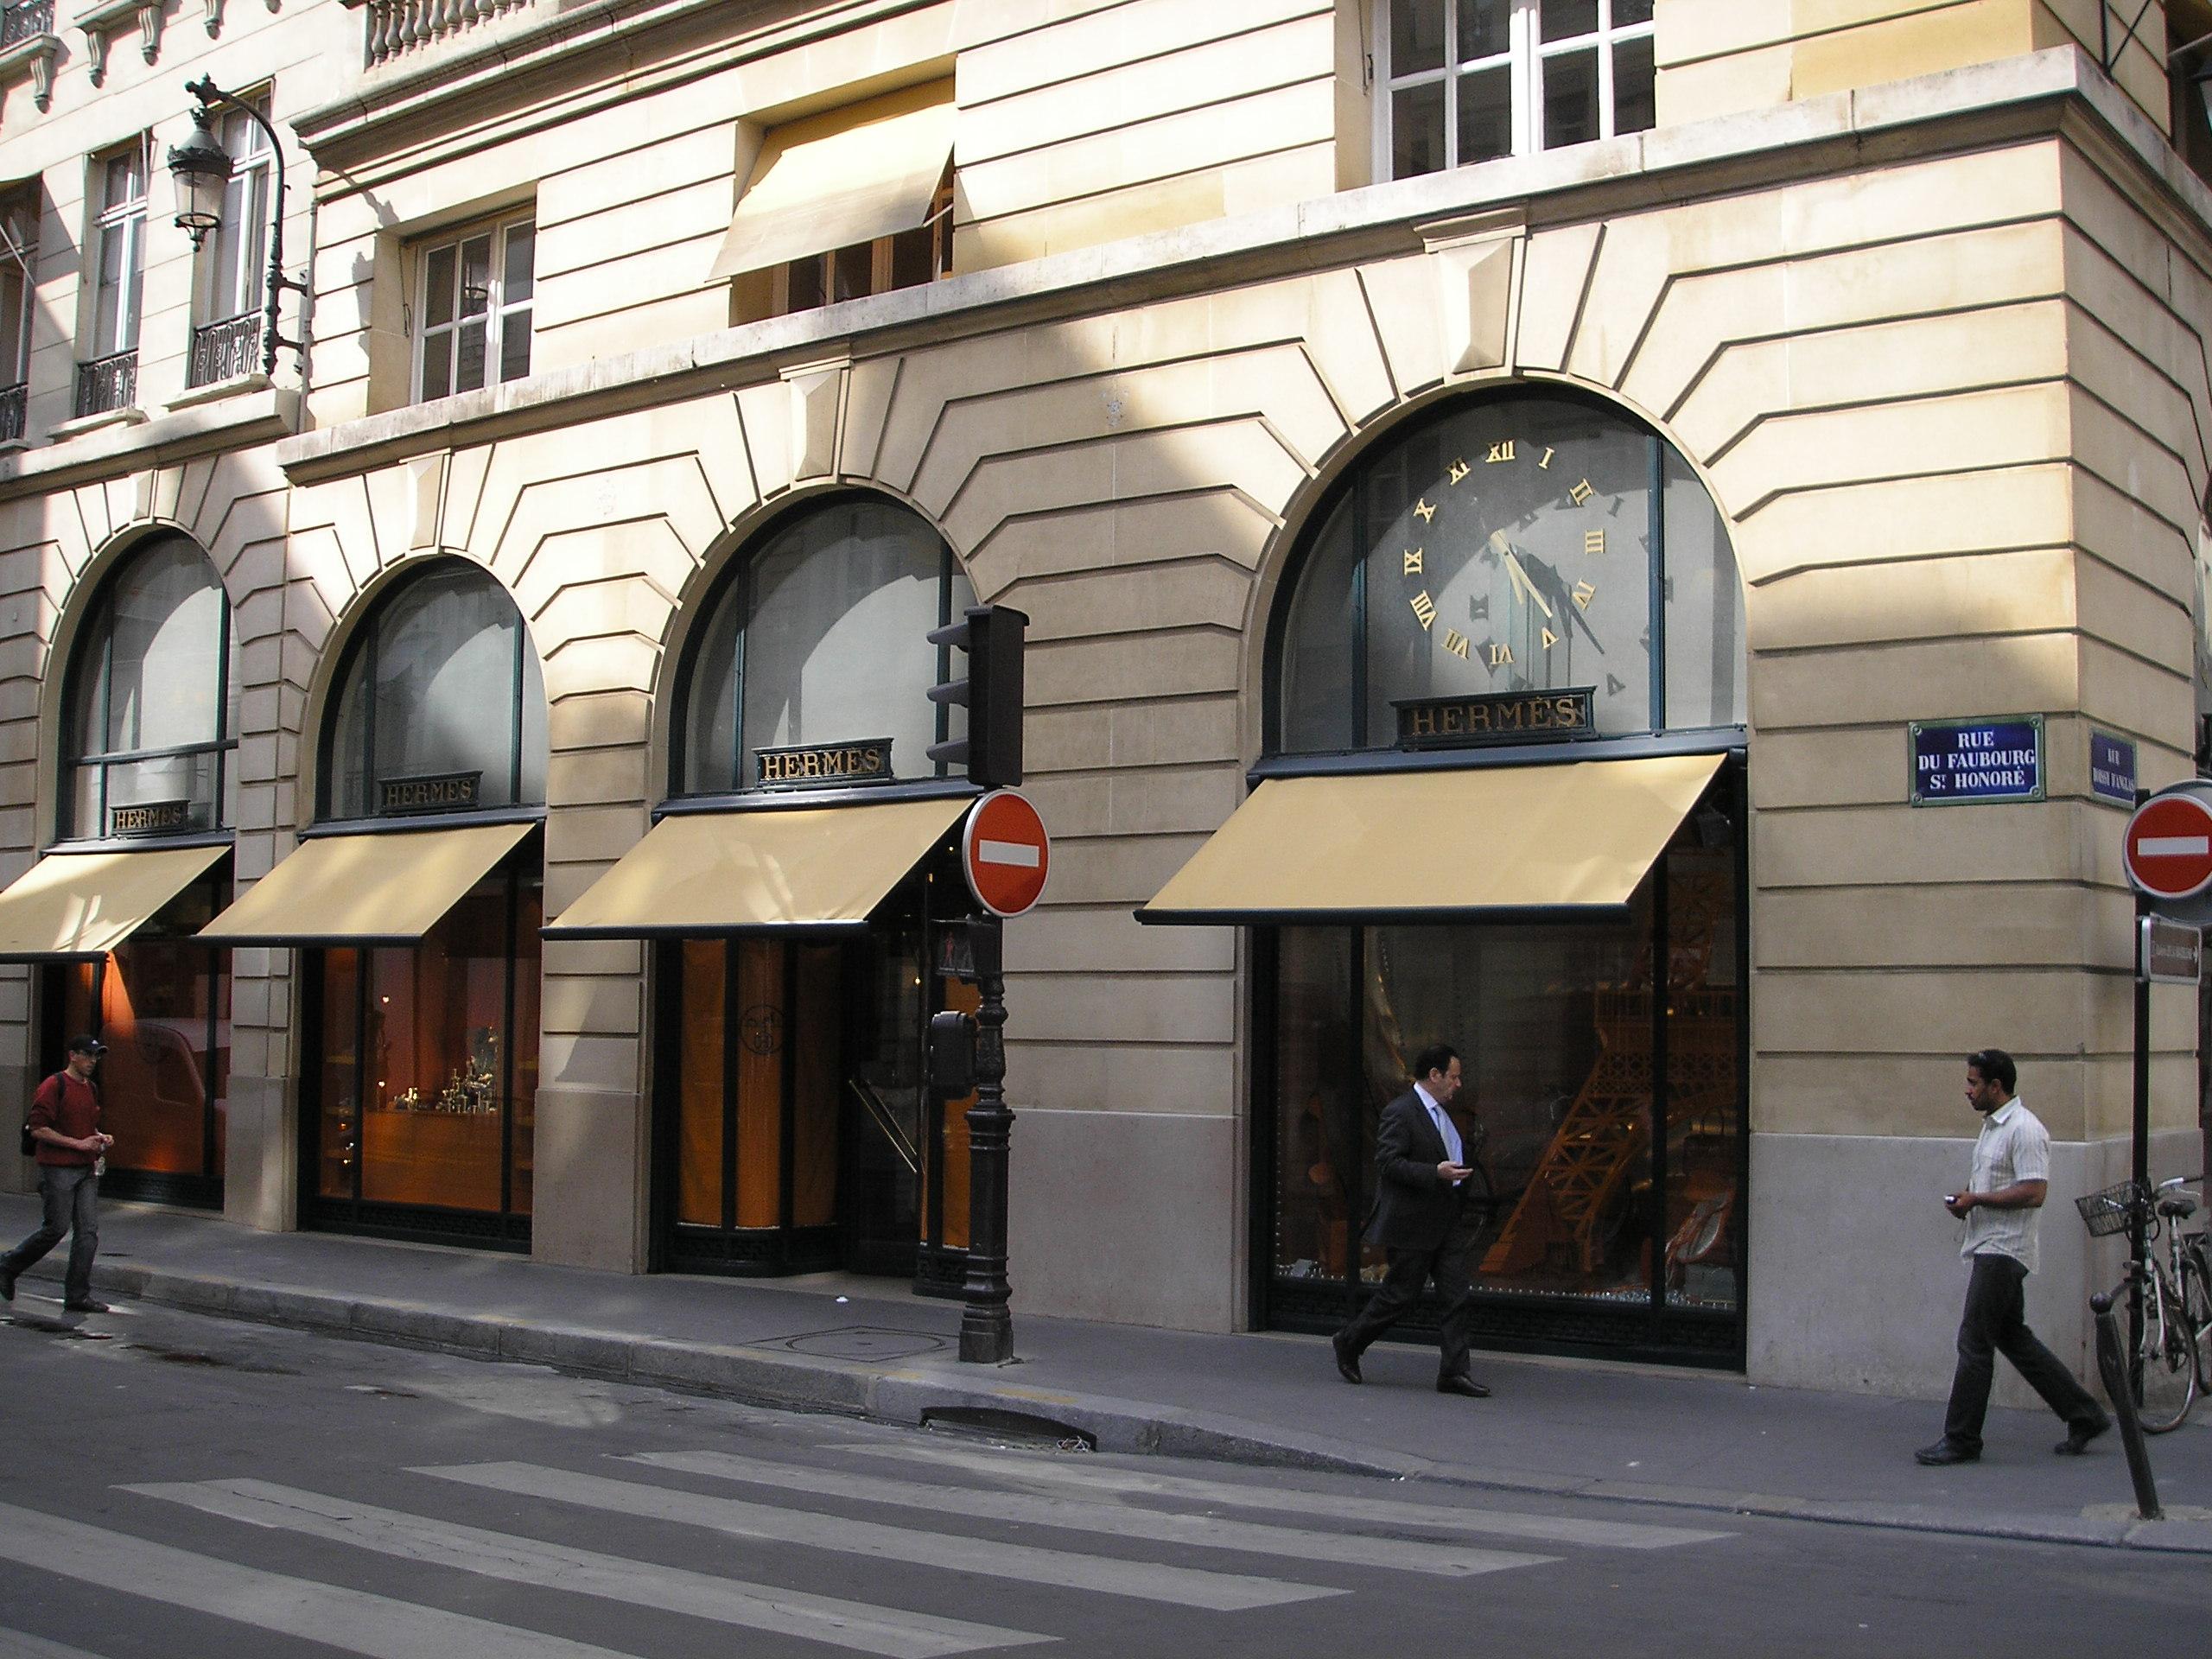 Saint Priest Hotel